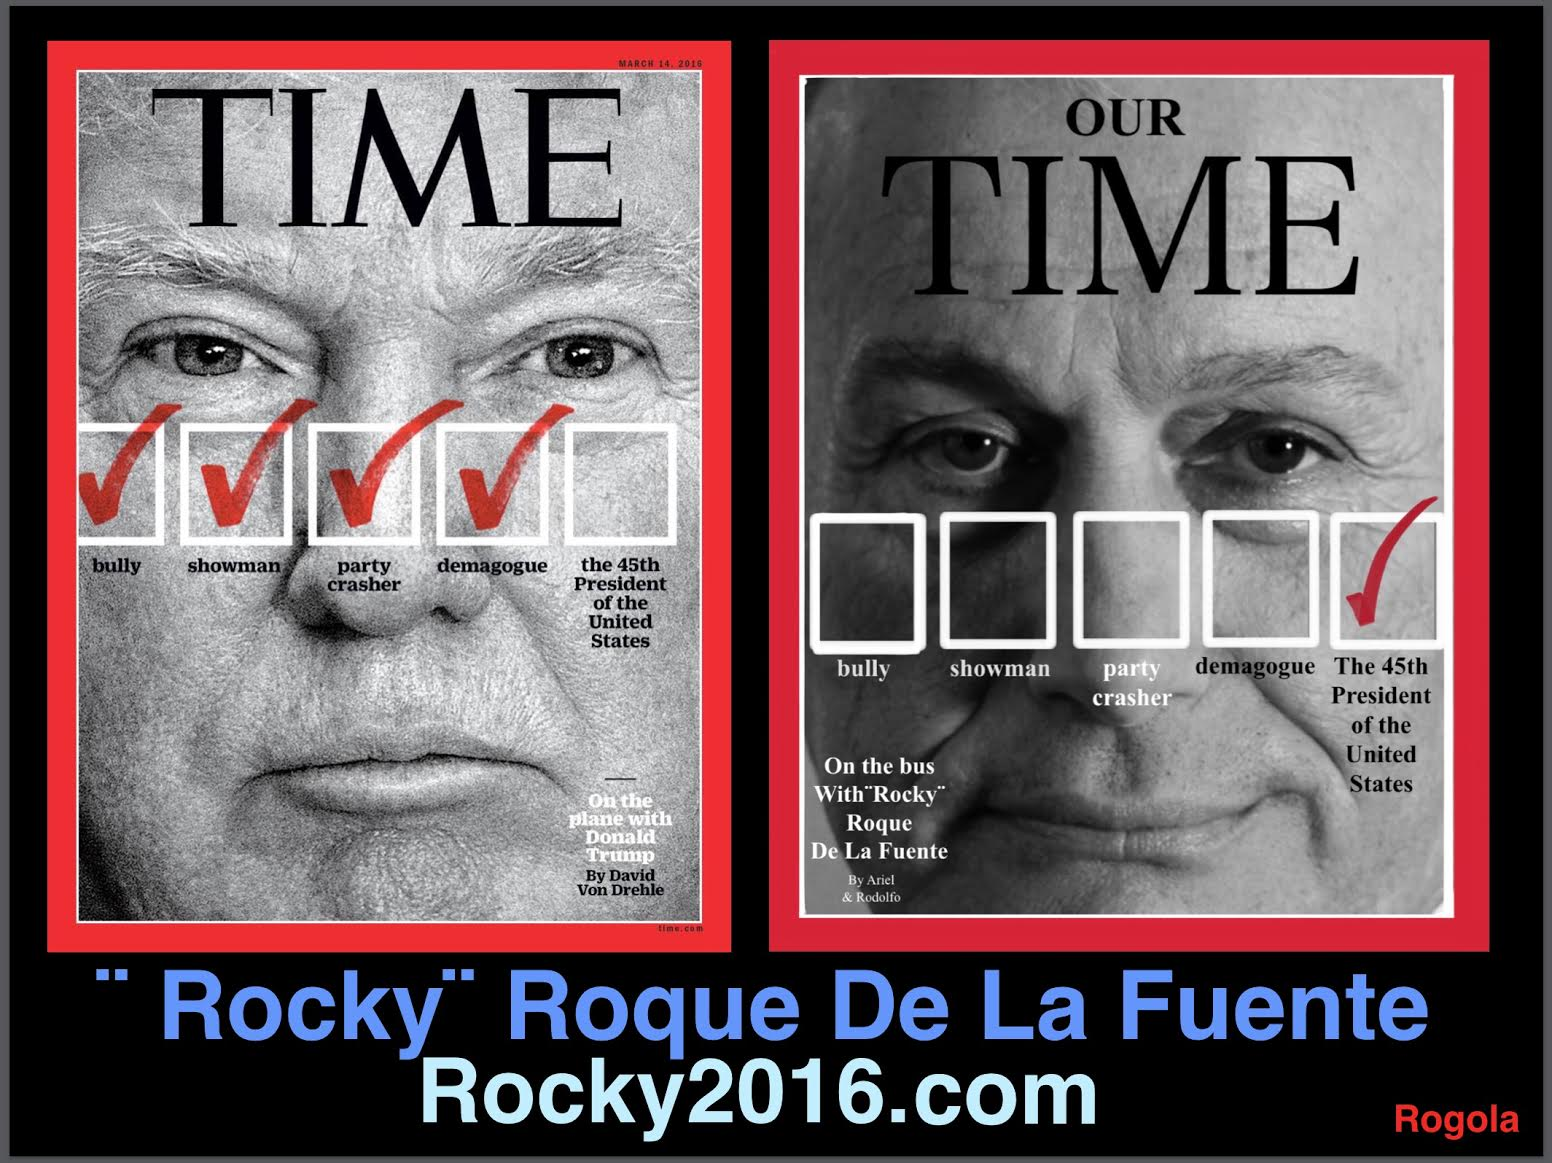 Roque Rocky De La Fuente On Twitter Alaska Caucus For Roque Rocky De La Fuente Today The Only Antidote To Trump Rockon Https T Co F3xny3skwt